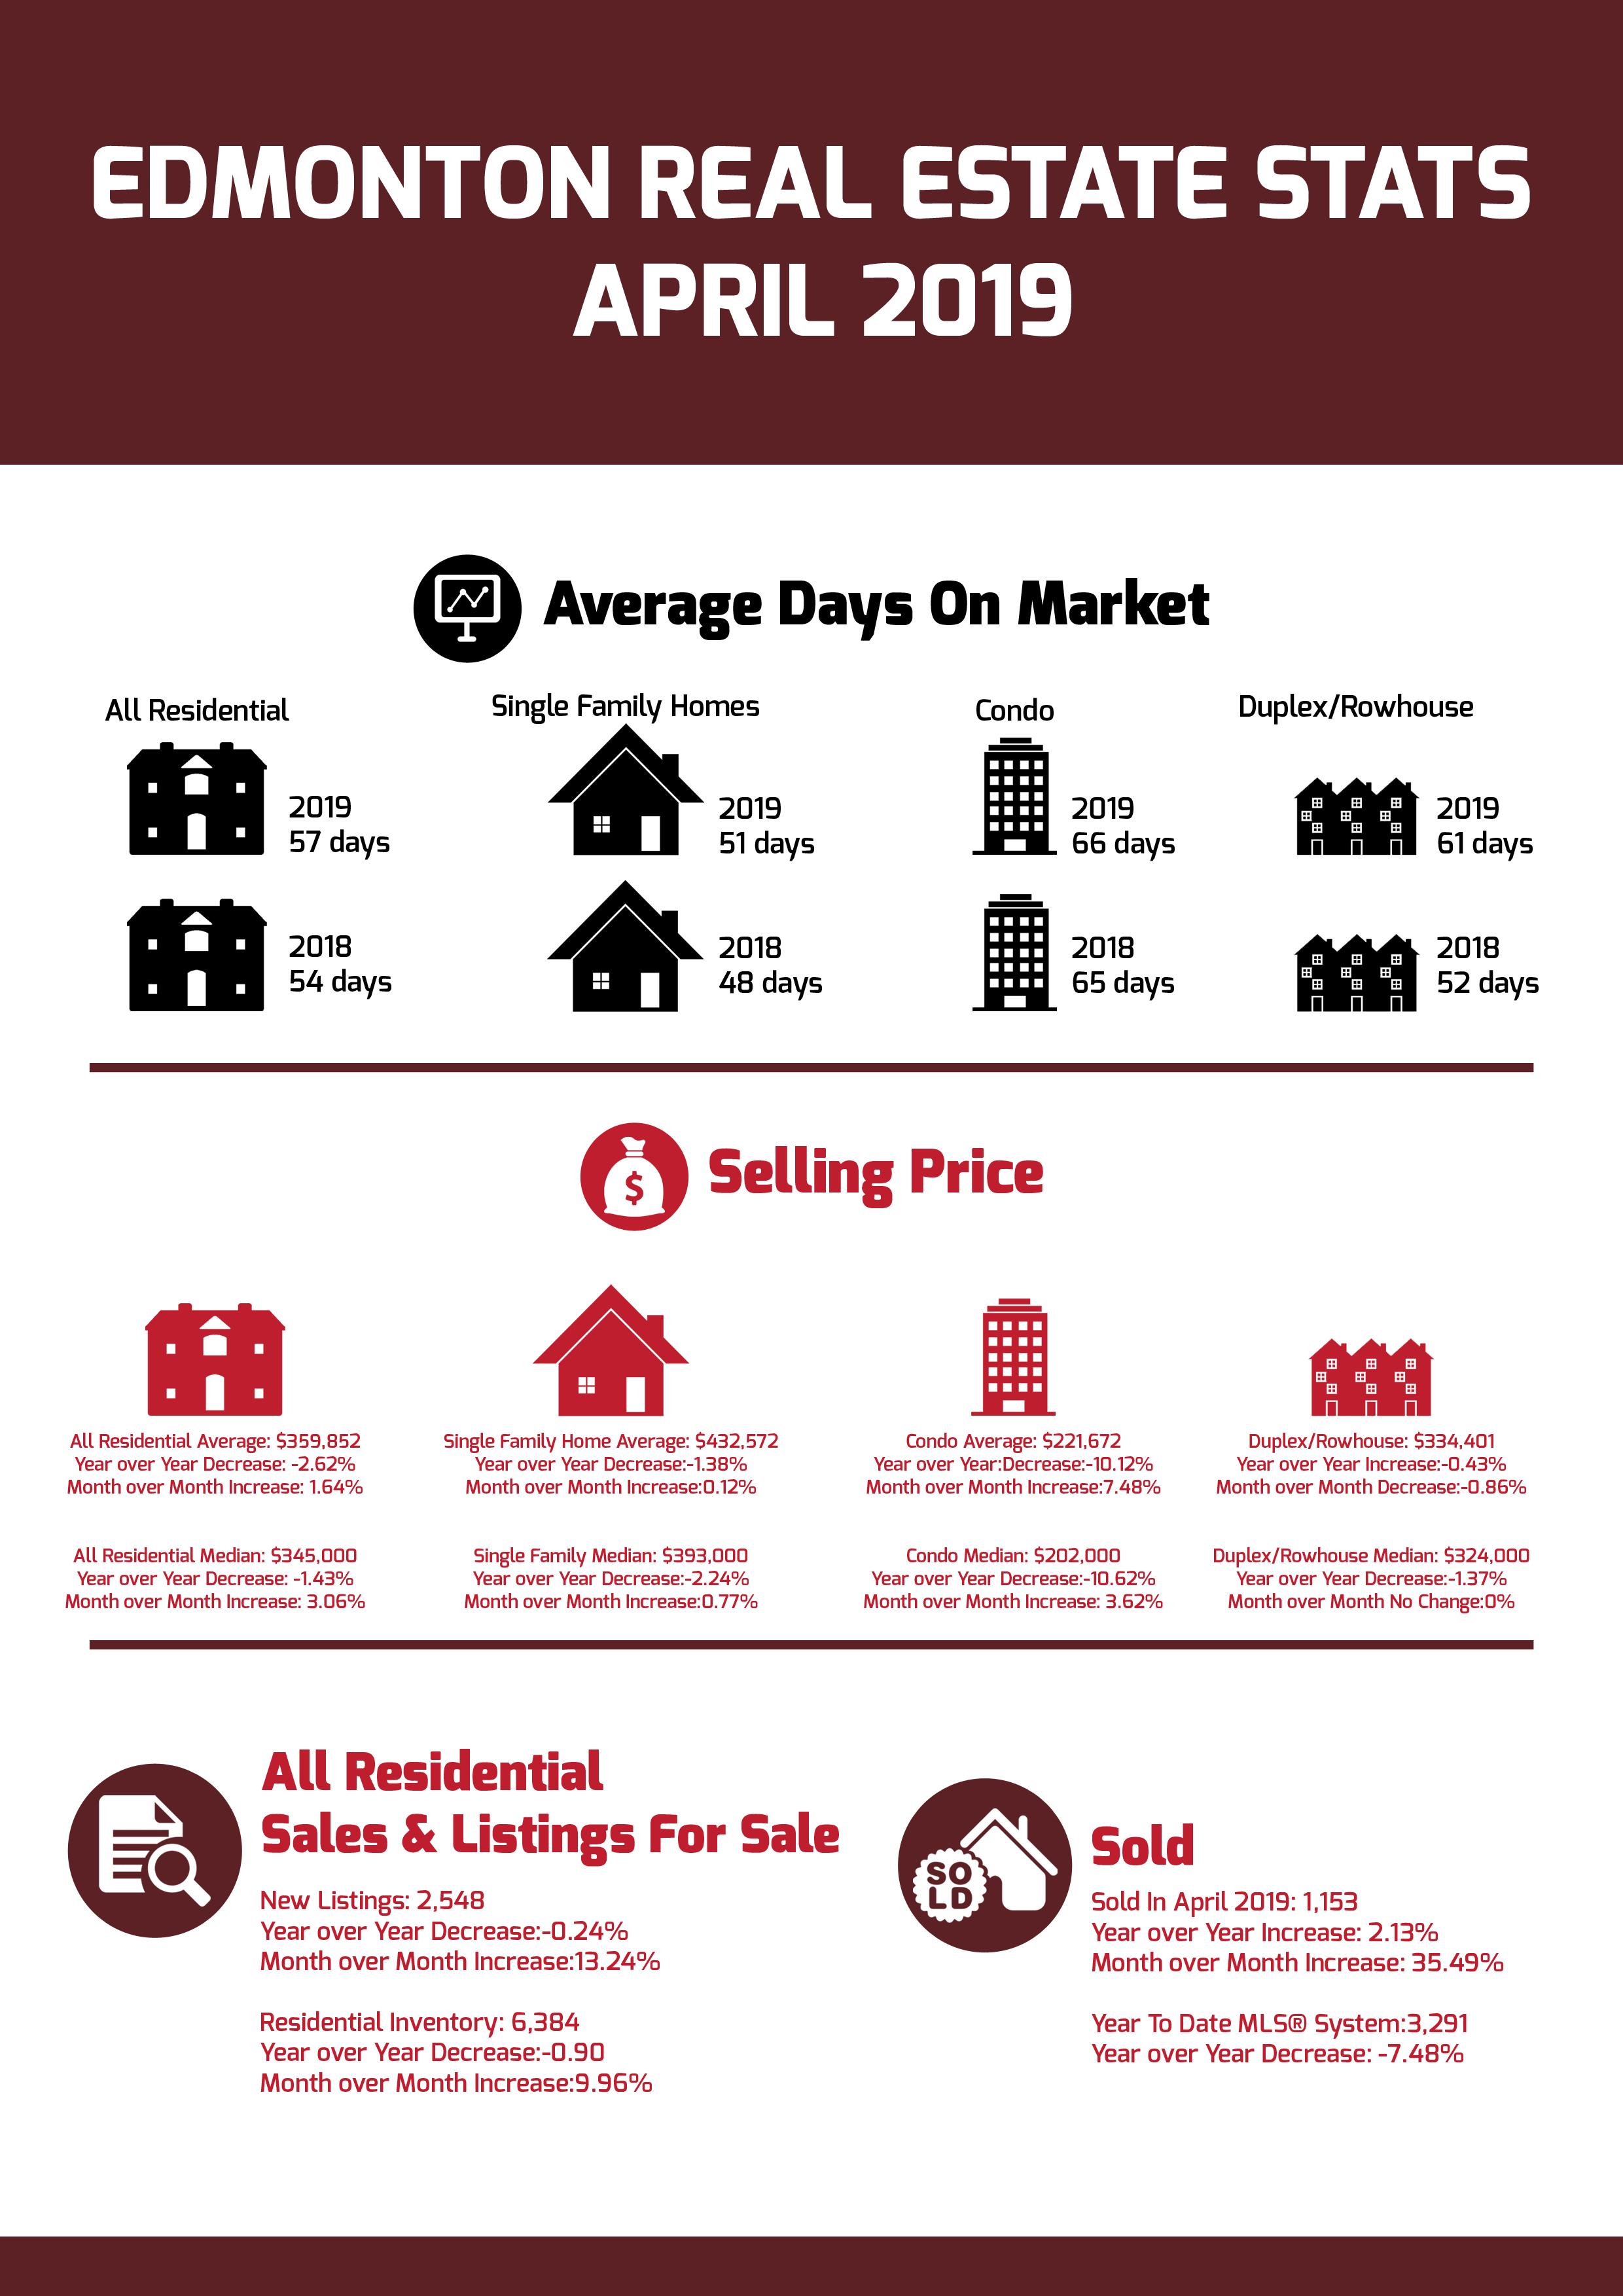 Edmonton Real Estate Stats April 2019